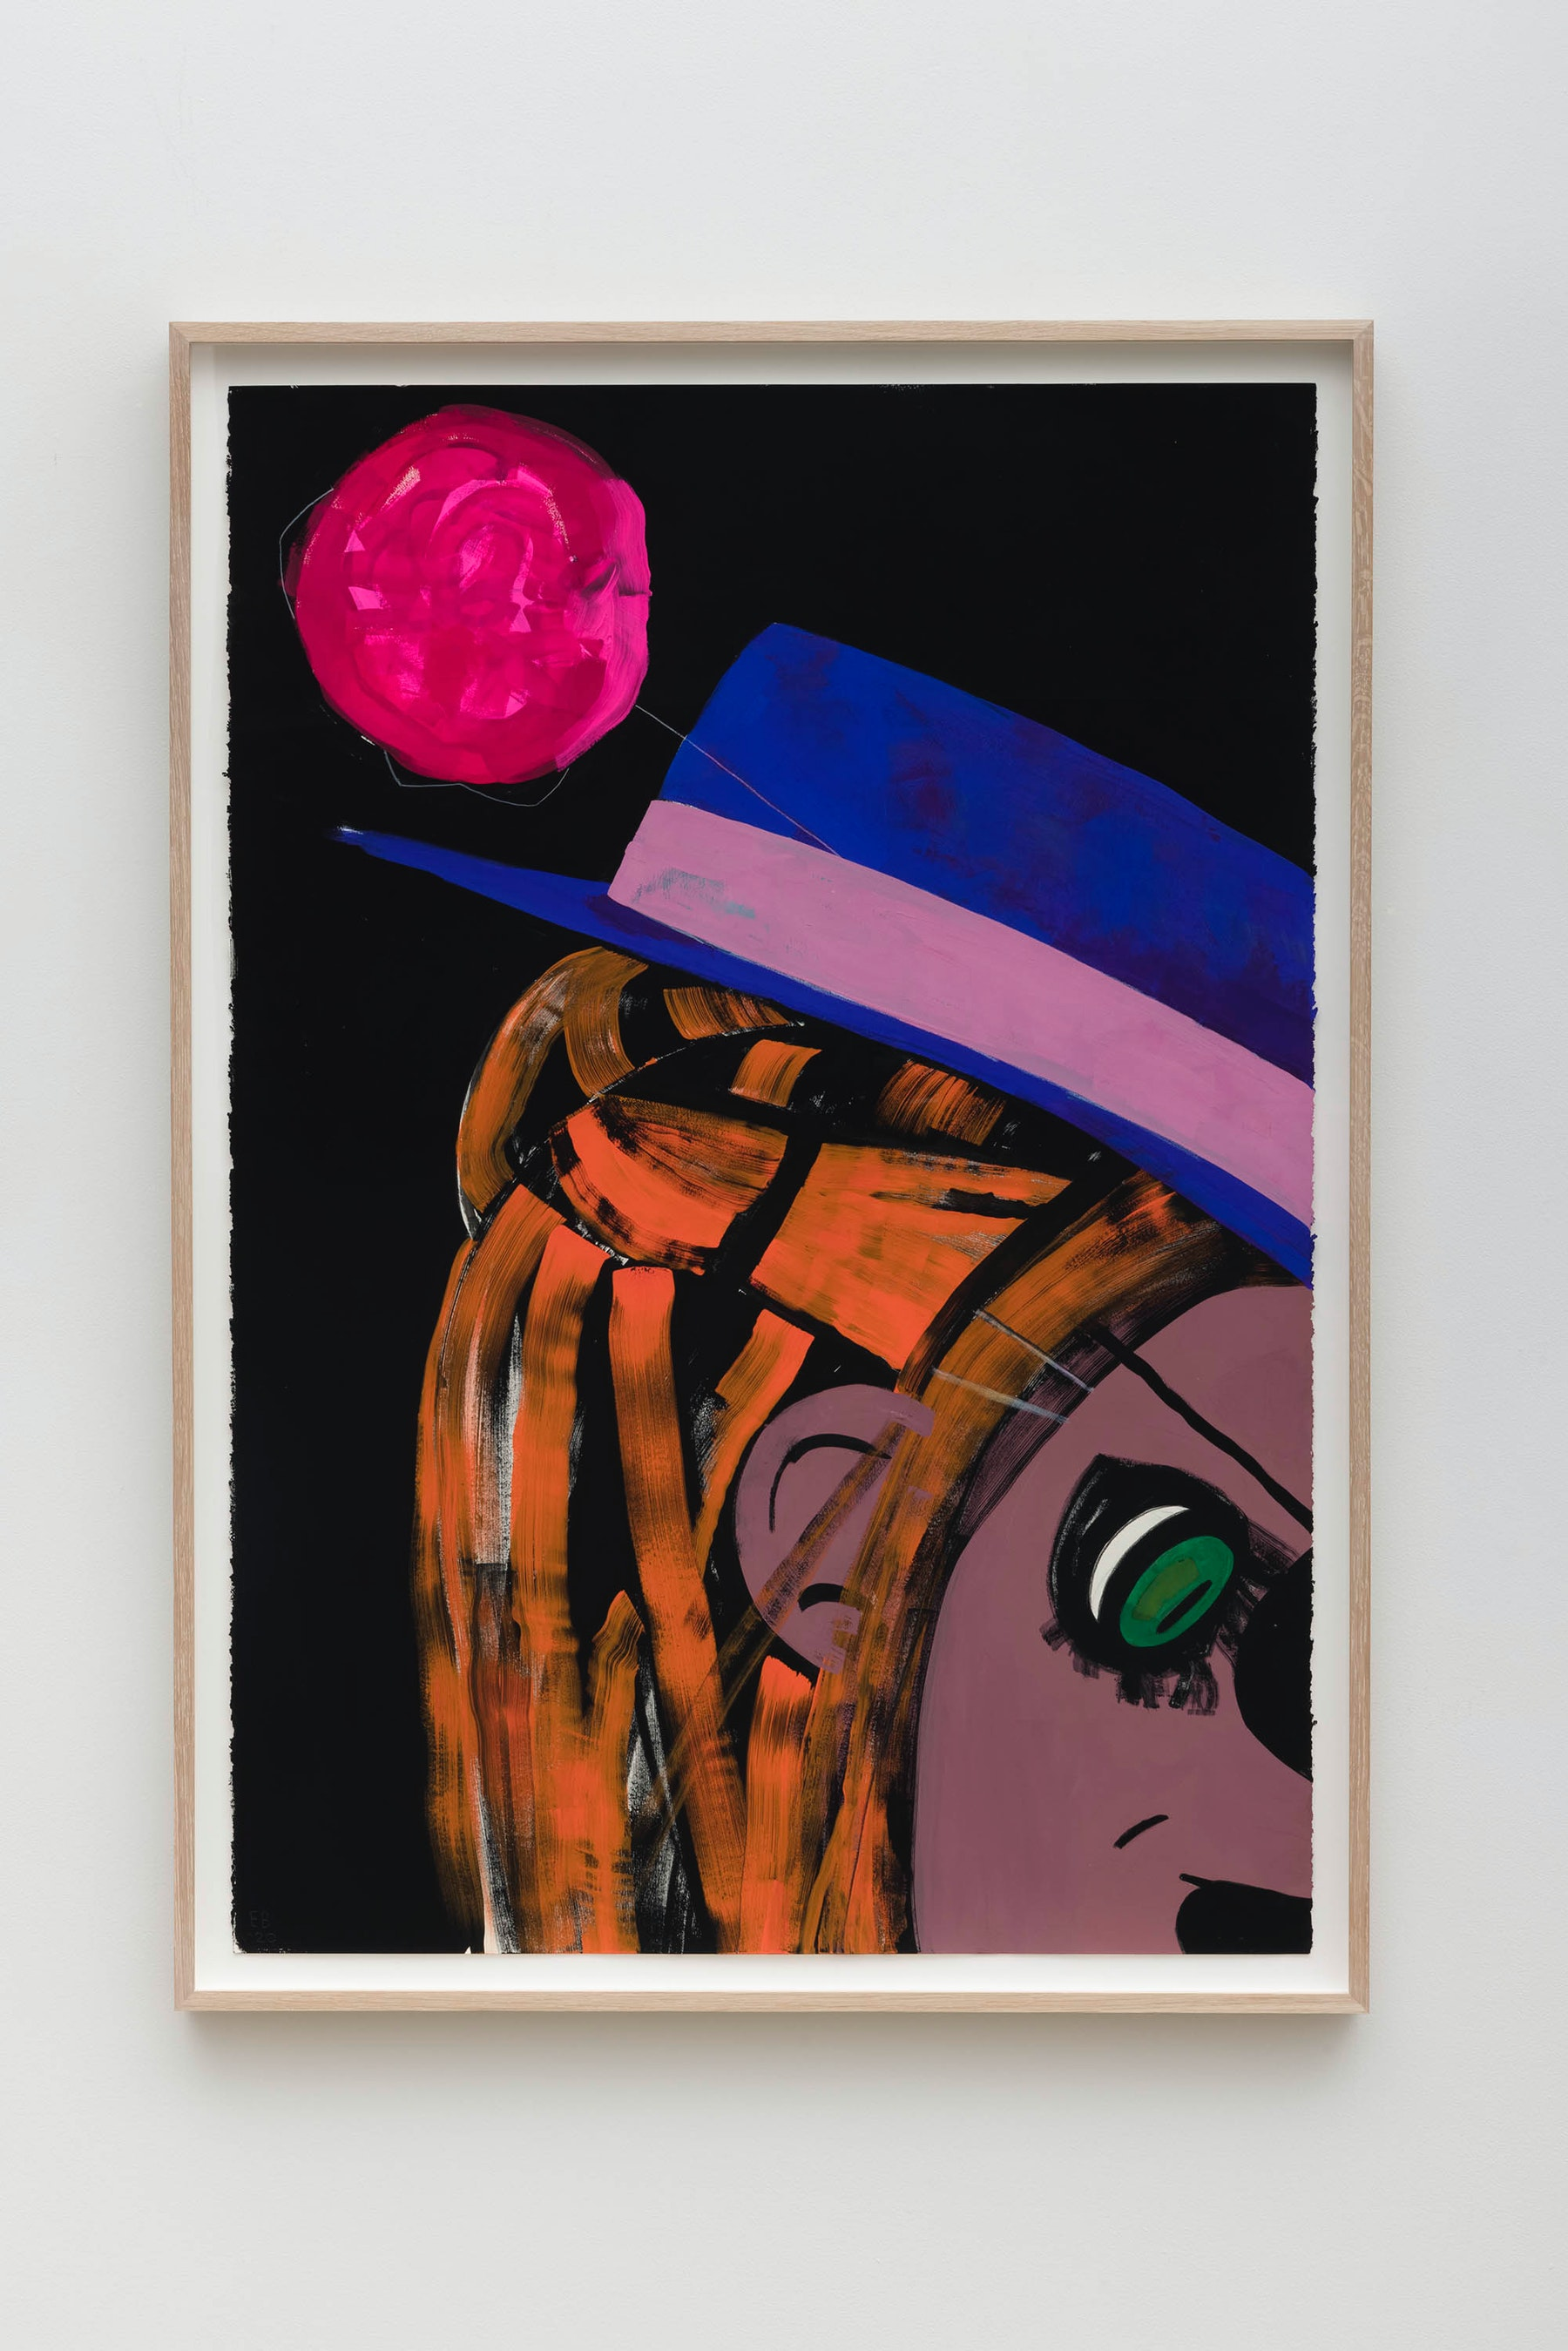 "Ellen Berkenblit ""The Red Balloon,"" 2020 Gouache and graphite on Legion Stonehenge paper 47"" x 33 ¹⁄₄"" x 2"" [HxWxD] (119.38 x 84.45 x 5.08 cm), framed Inventory #BER208 Courtesy of the artist and Vielmetter Los Angeles Photo credit: Jeff McLane"